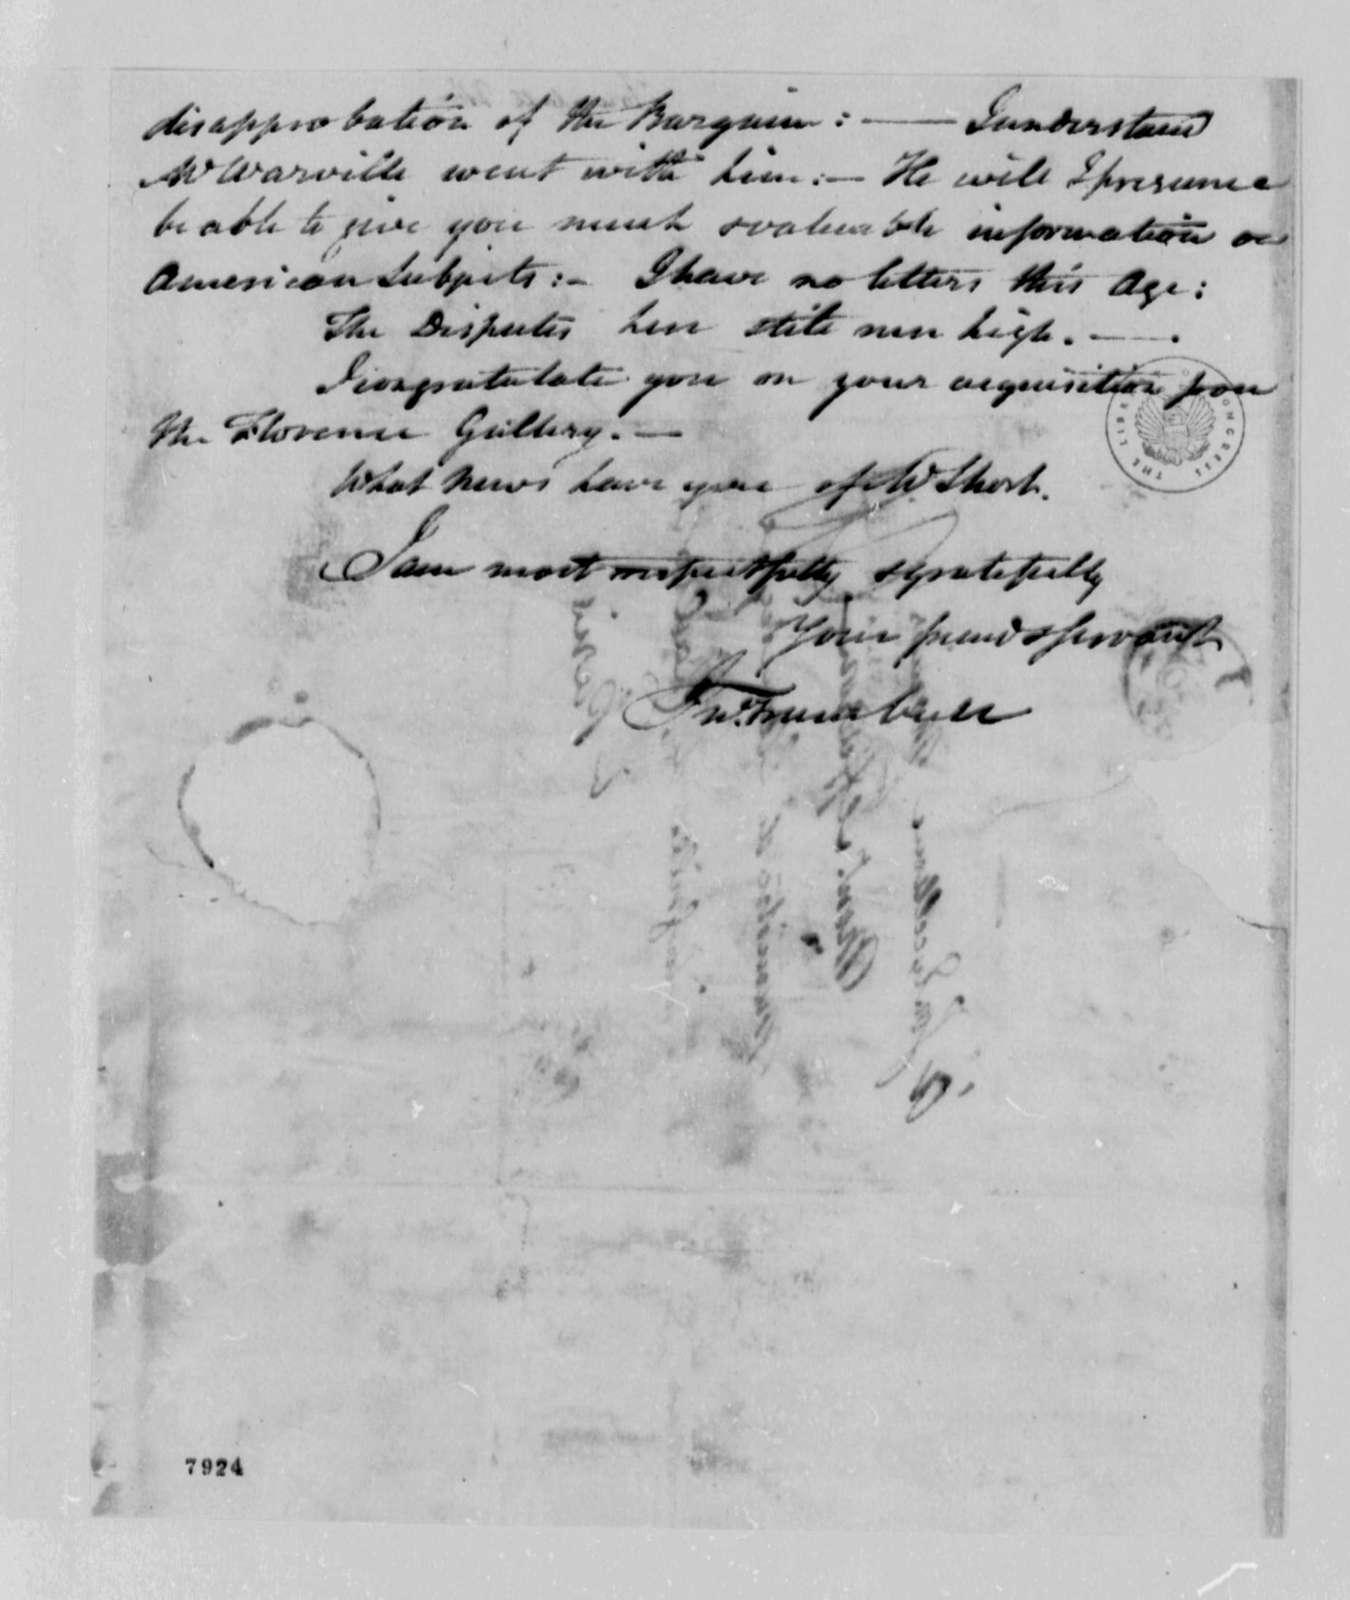 John Trumbull to Thomas Jefferson, January 24, 1789